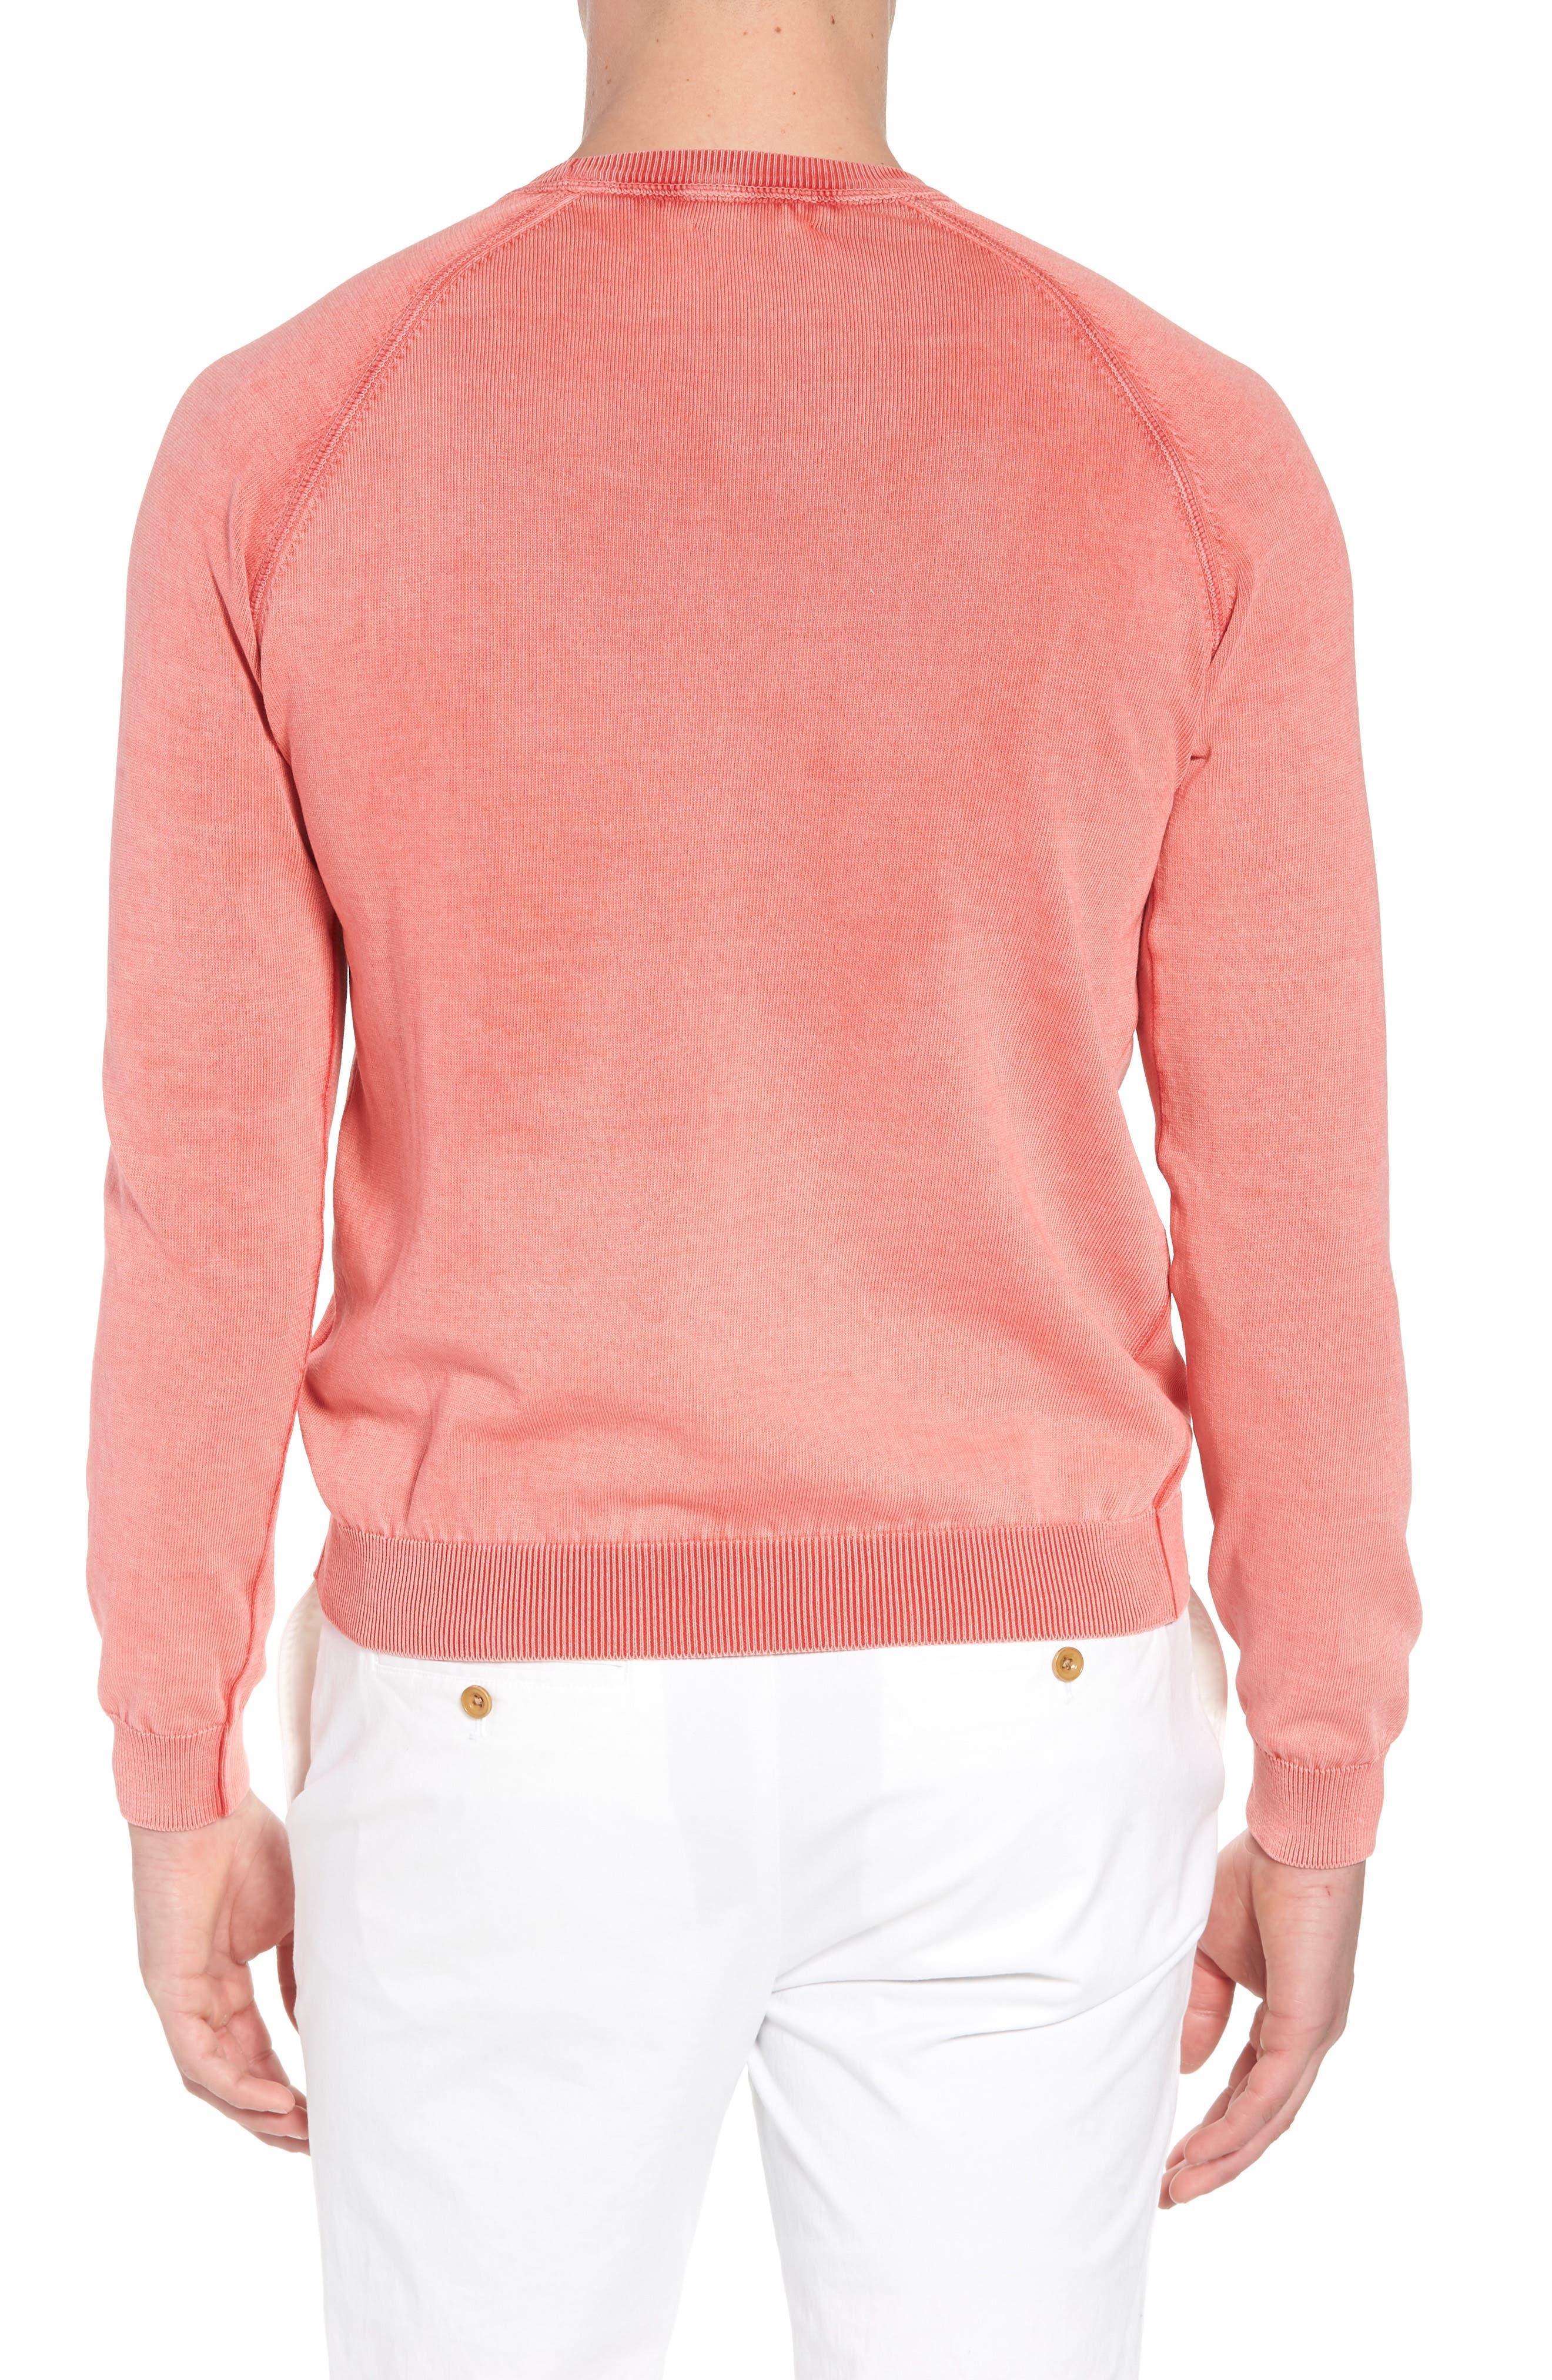 Stonewash Cotton Sweatshirt,                             Alternate thumbnail 2, color,                             Washed Coral